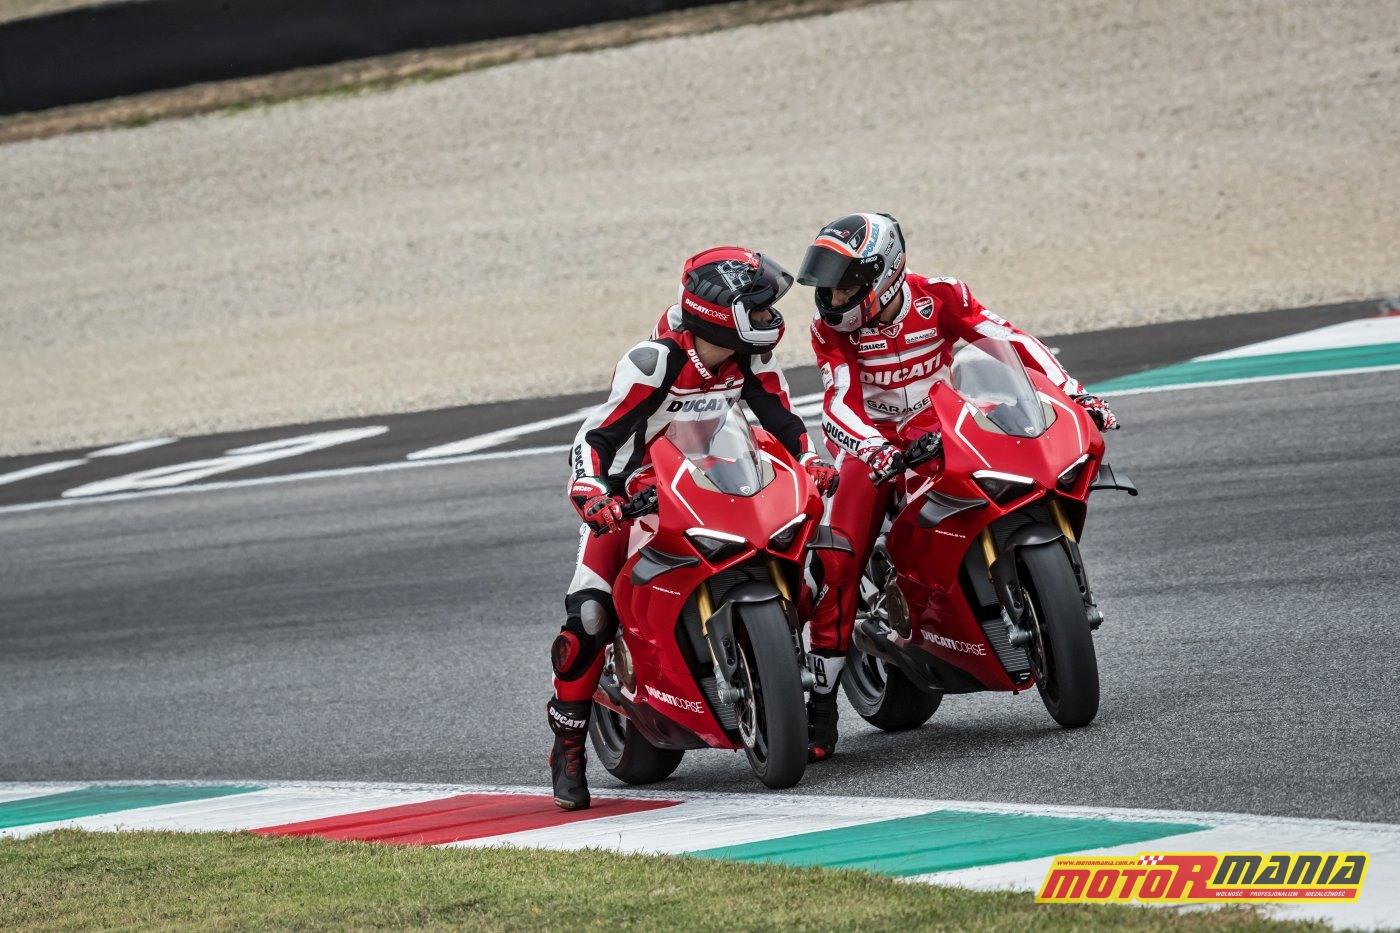 Ducati Panigale V4 R 2019 (54)